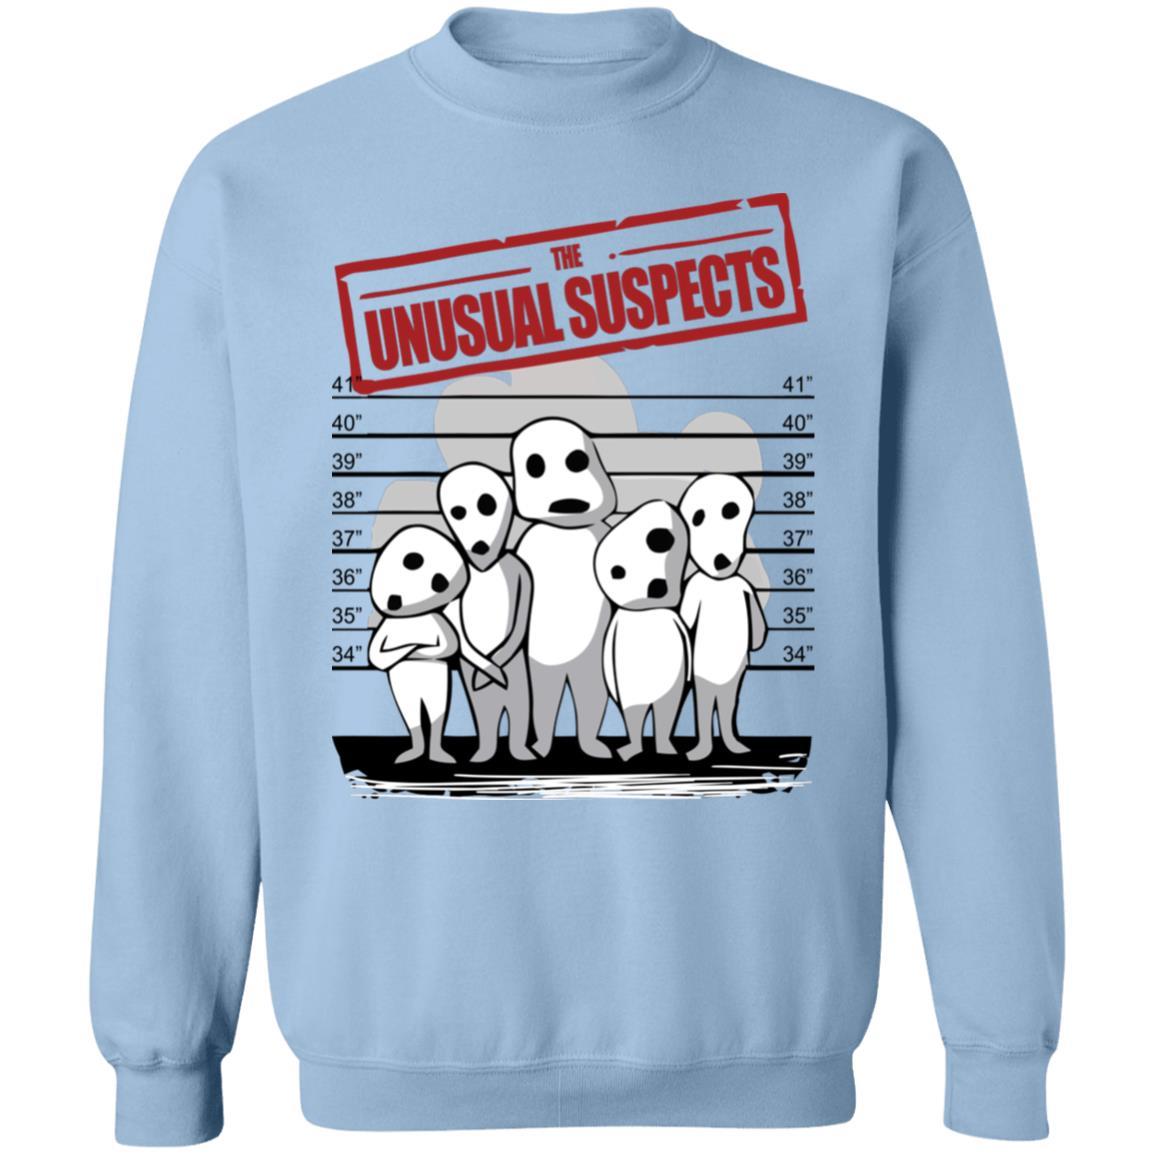 Princess Mononoke – Unusual Suspects Sweatshirt